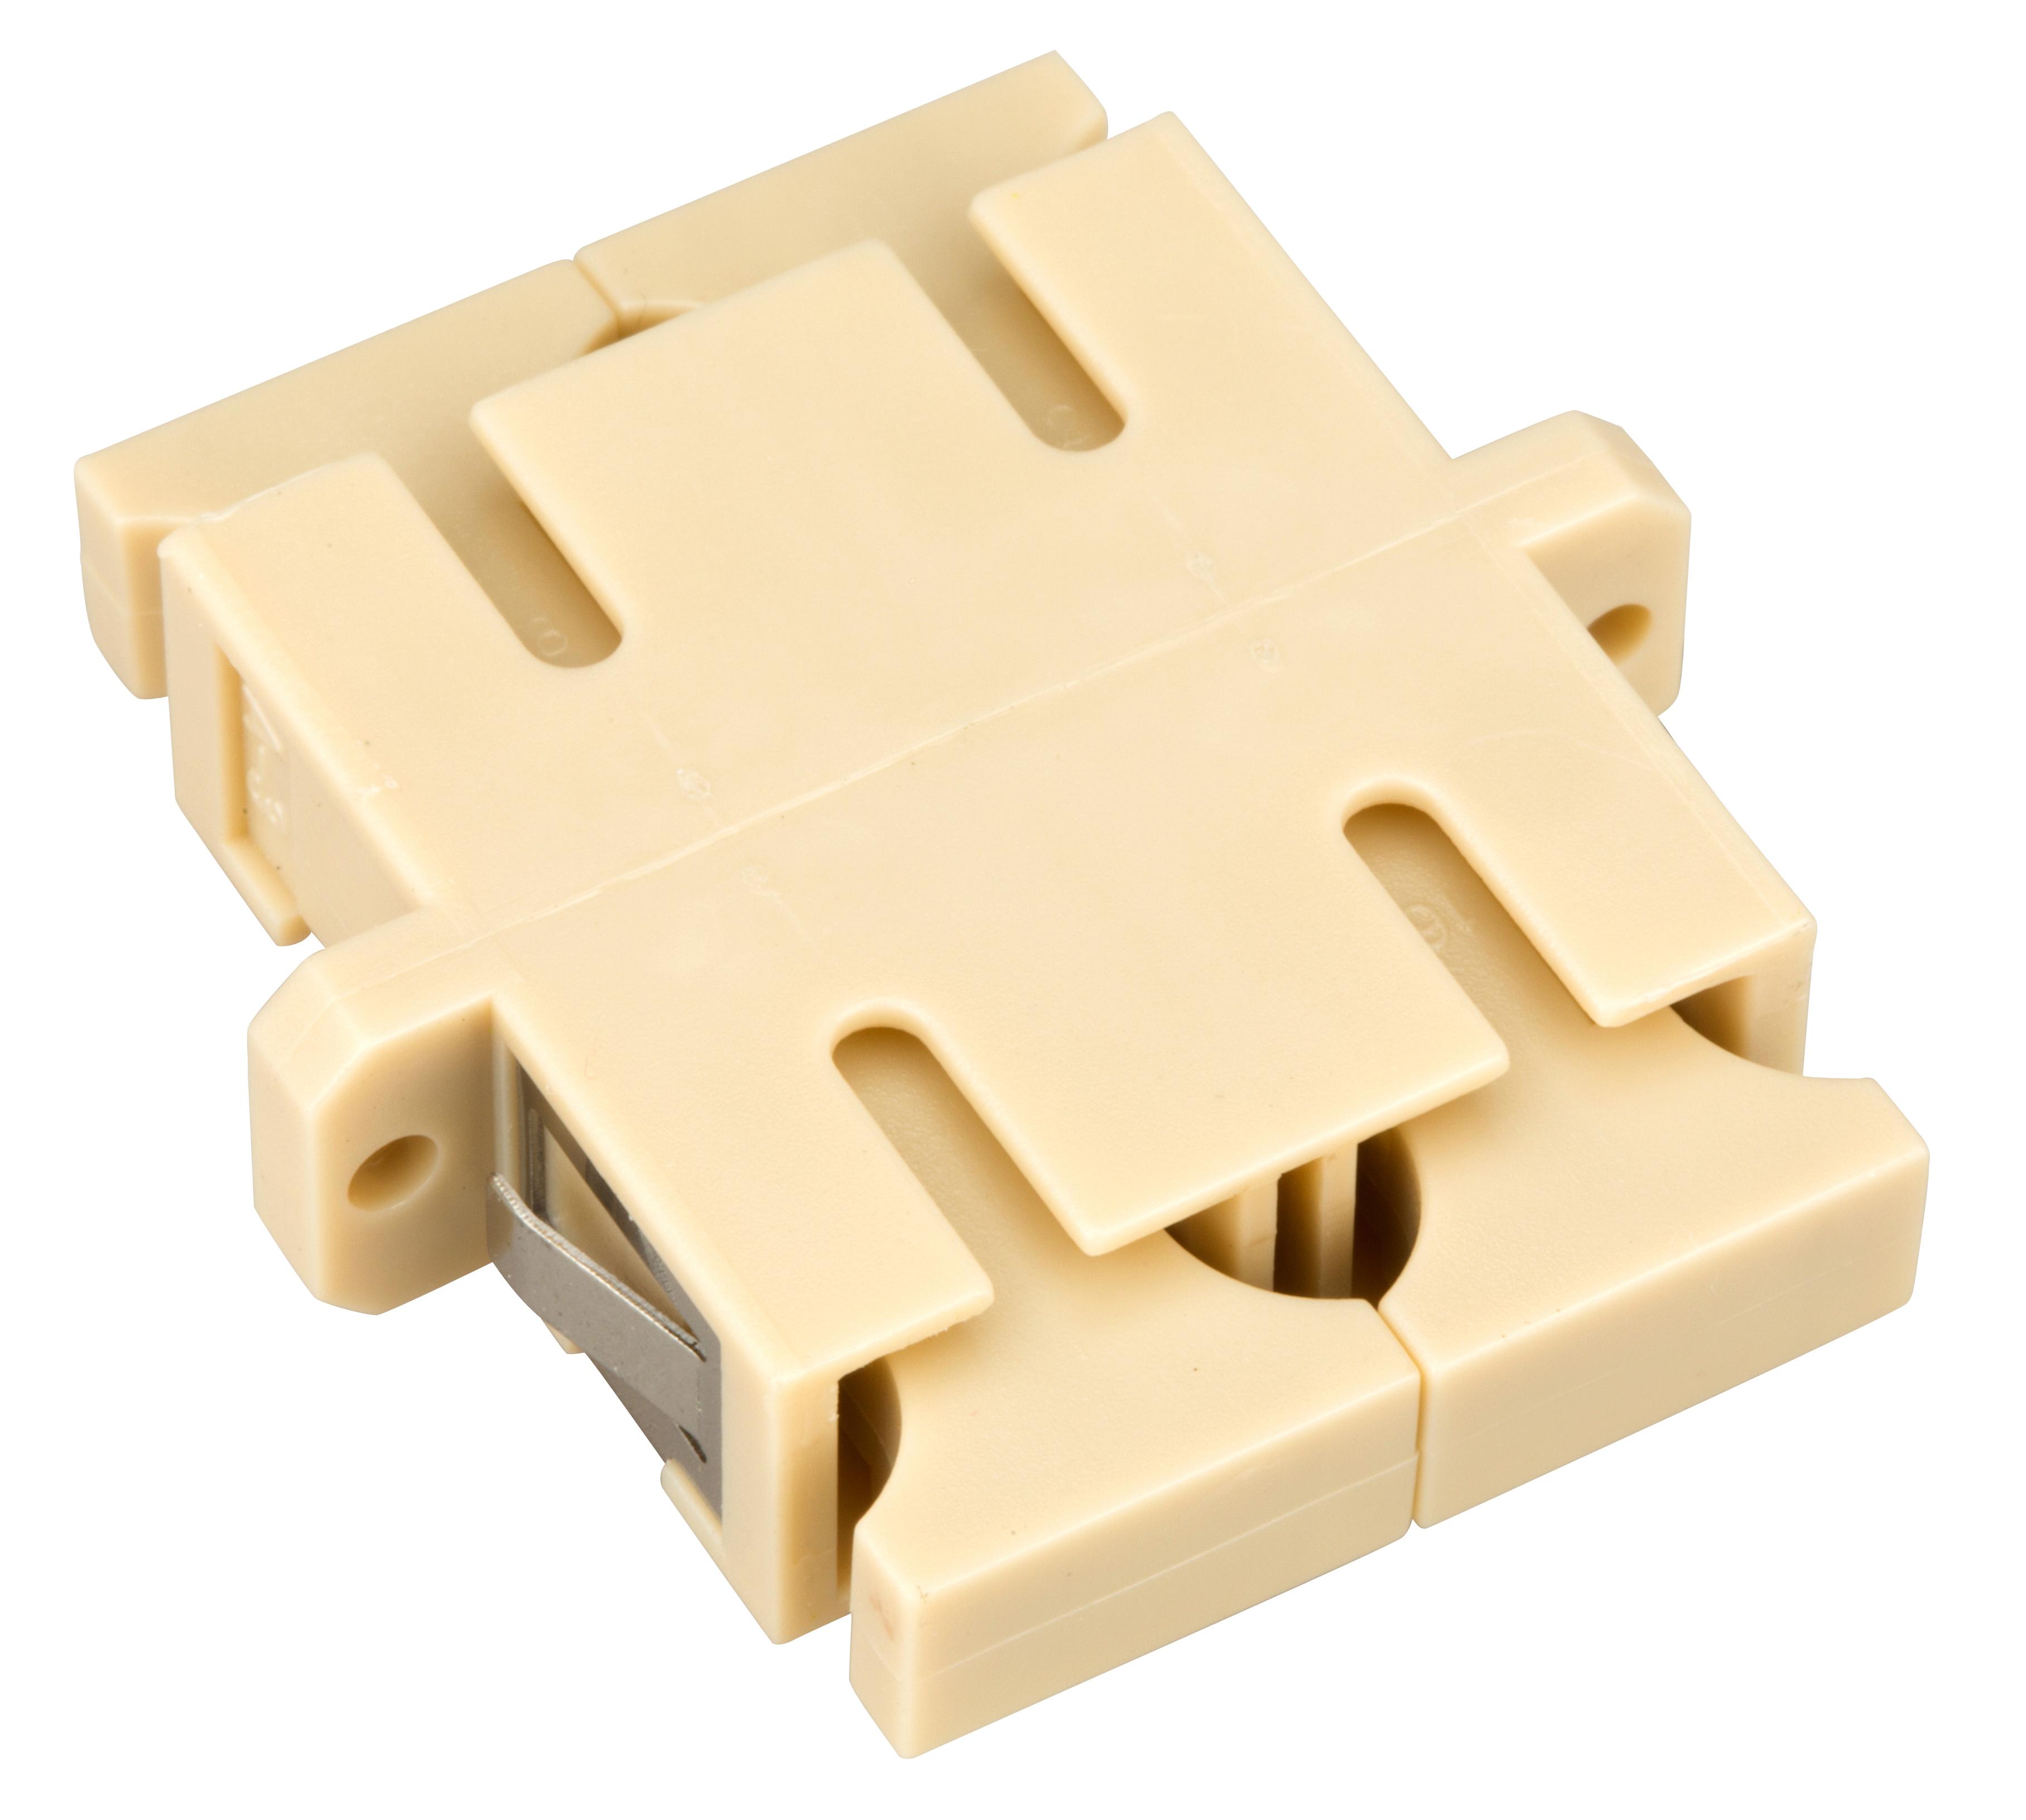 1 Stk LWL Kupplung SC-Duplex, Multimode, phbr, Flansch, beige, ECO HMOLE00059